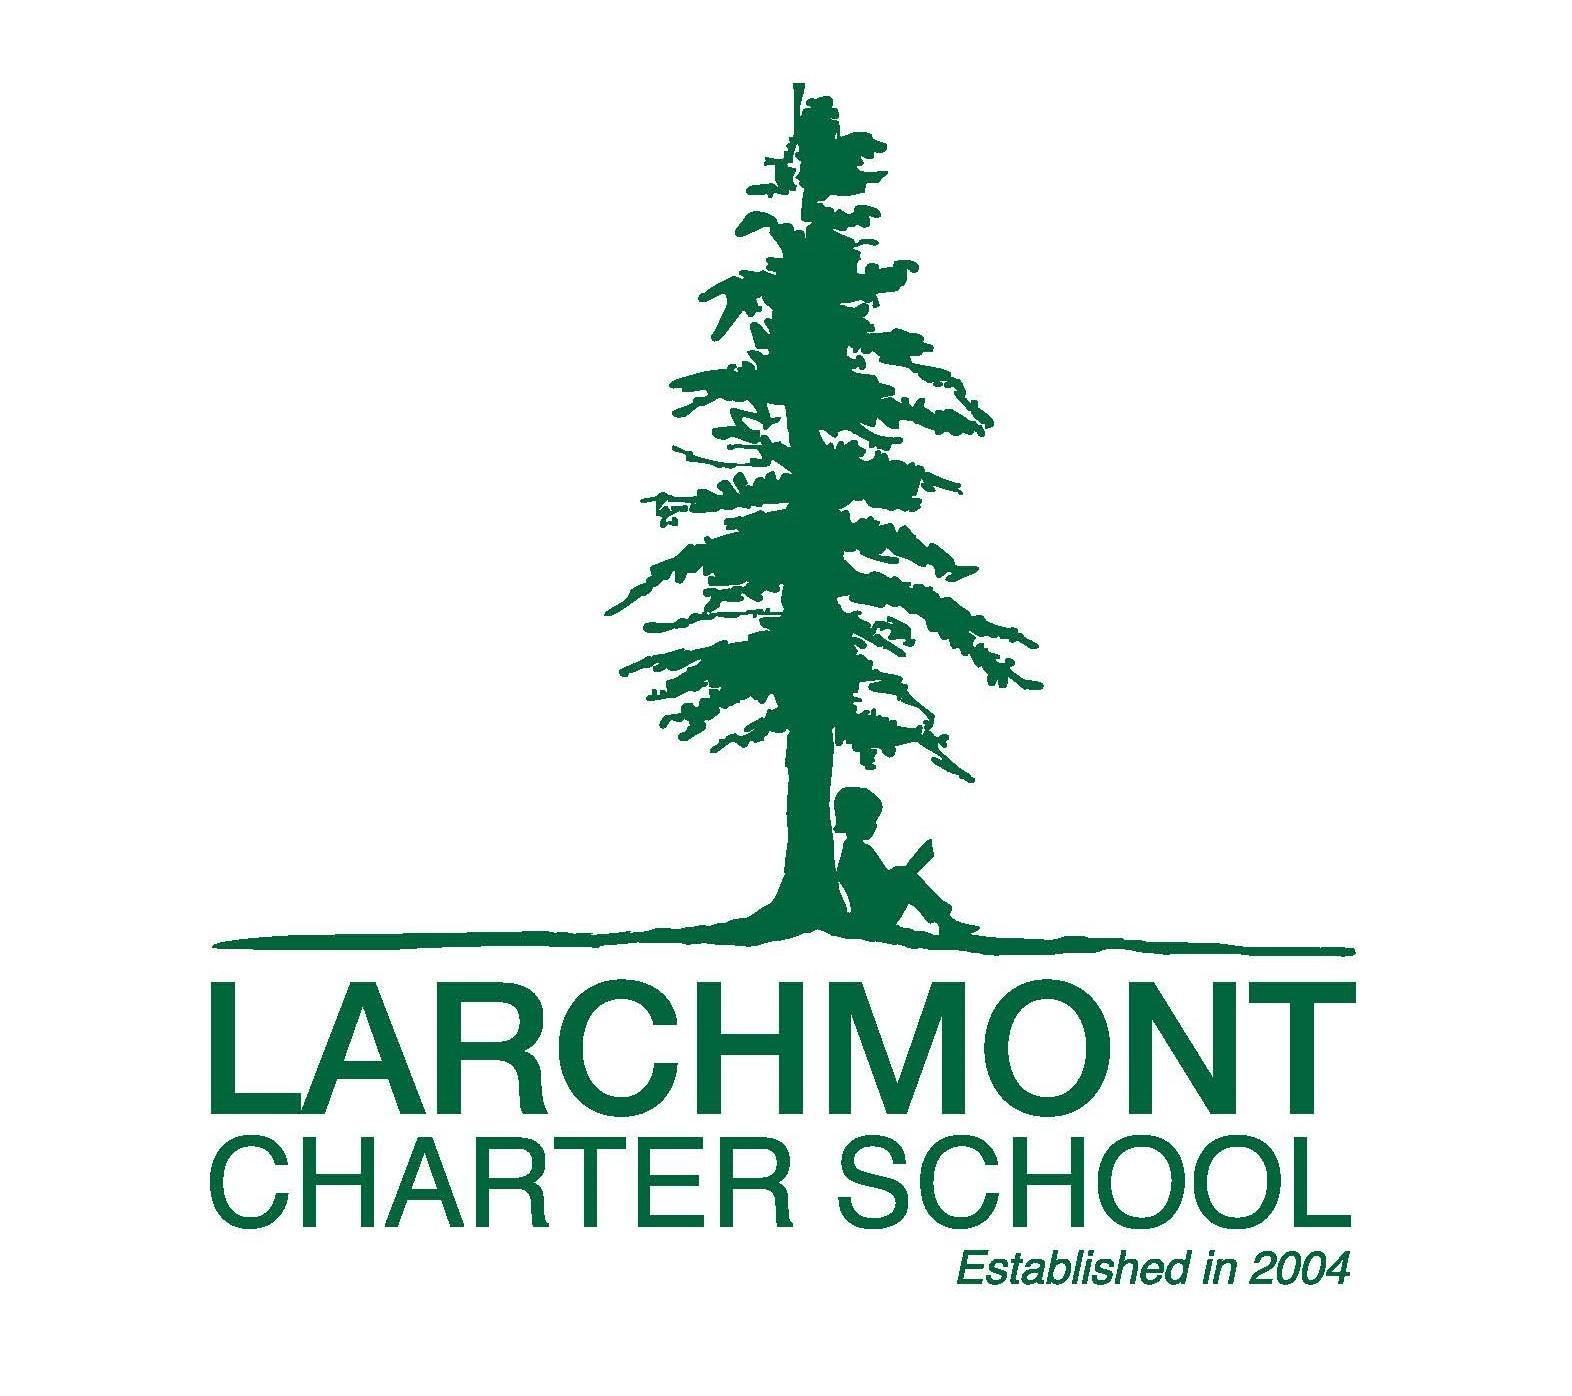 Larchmont Charter